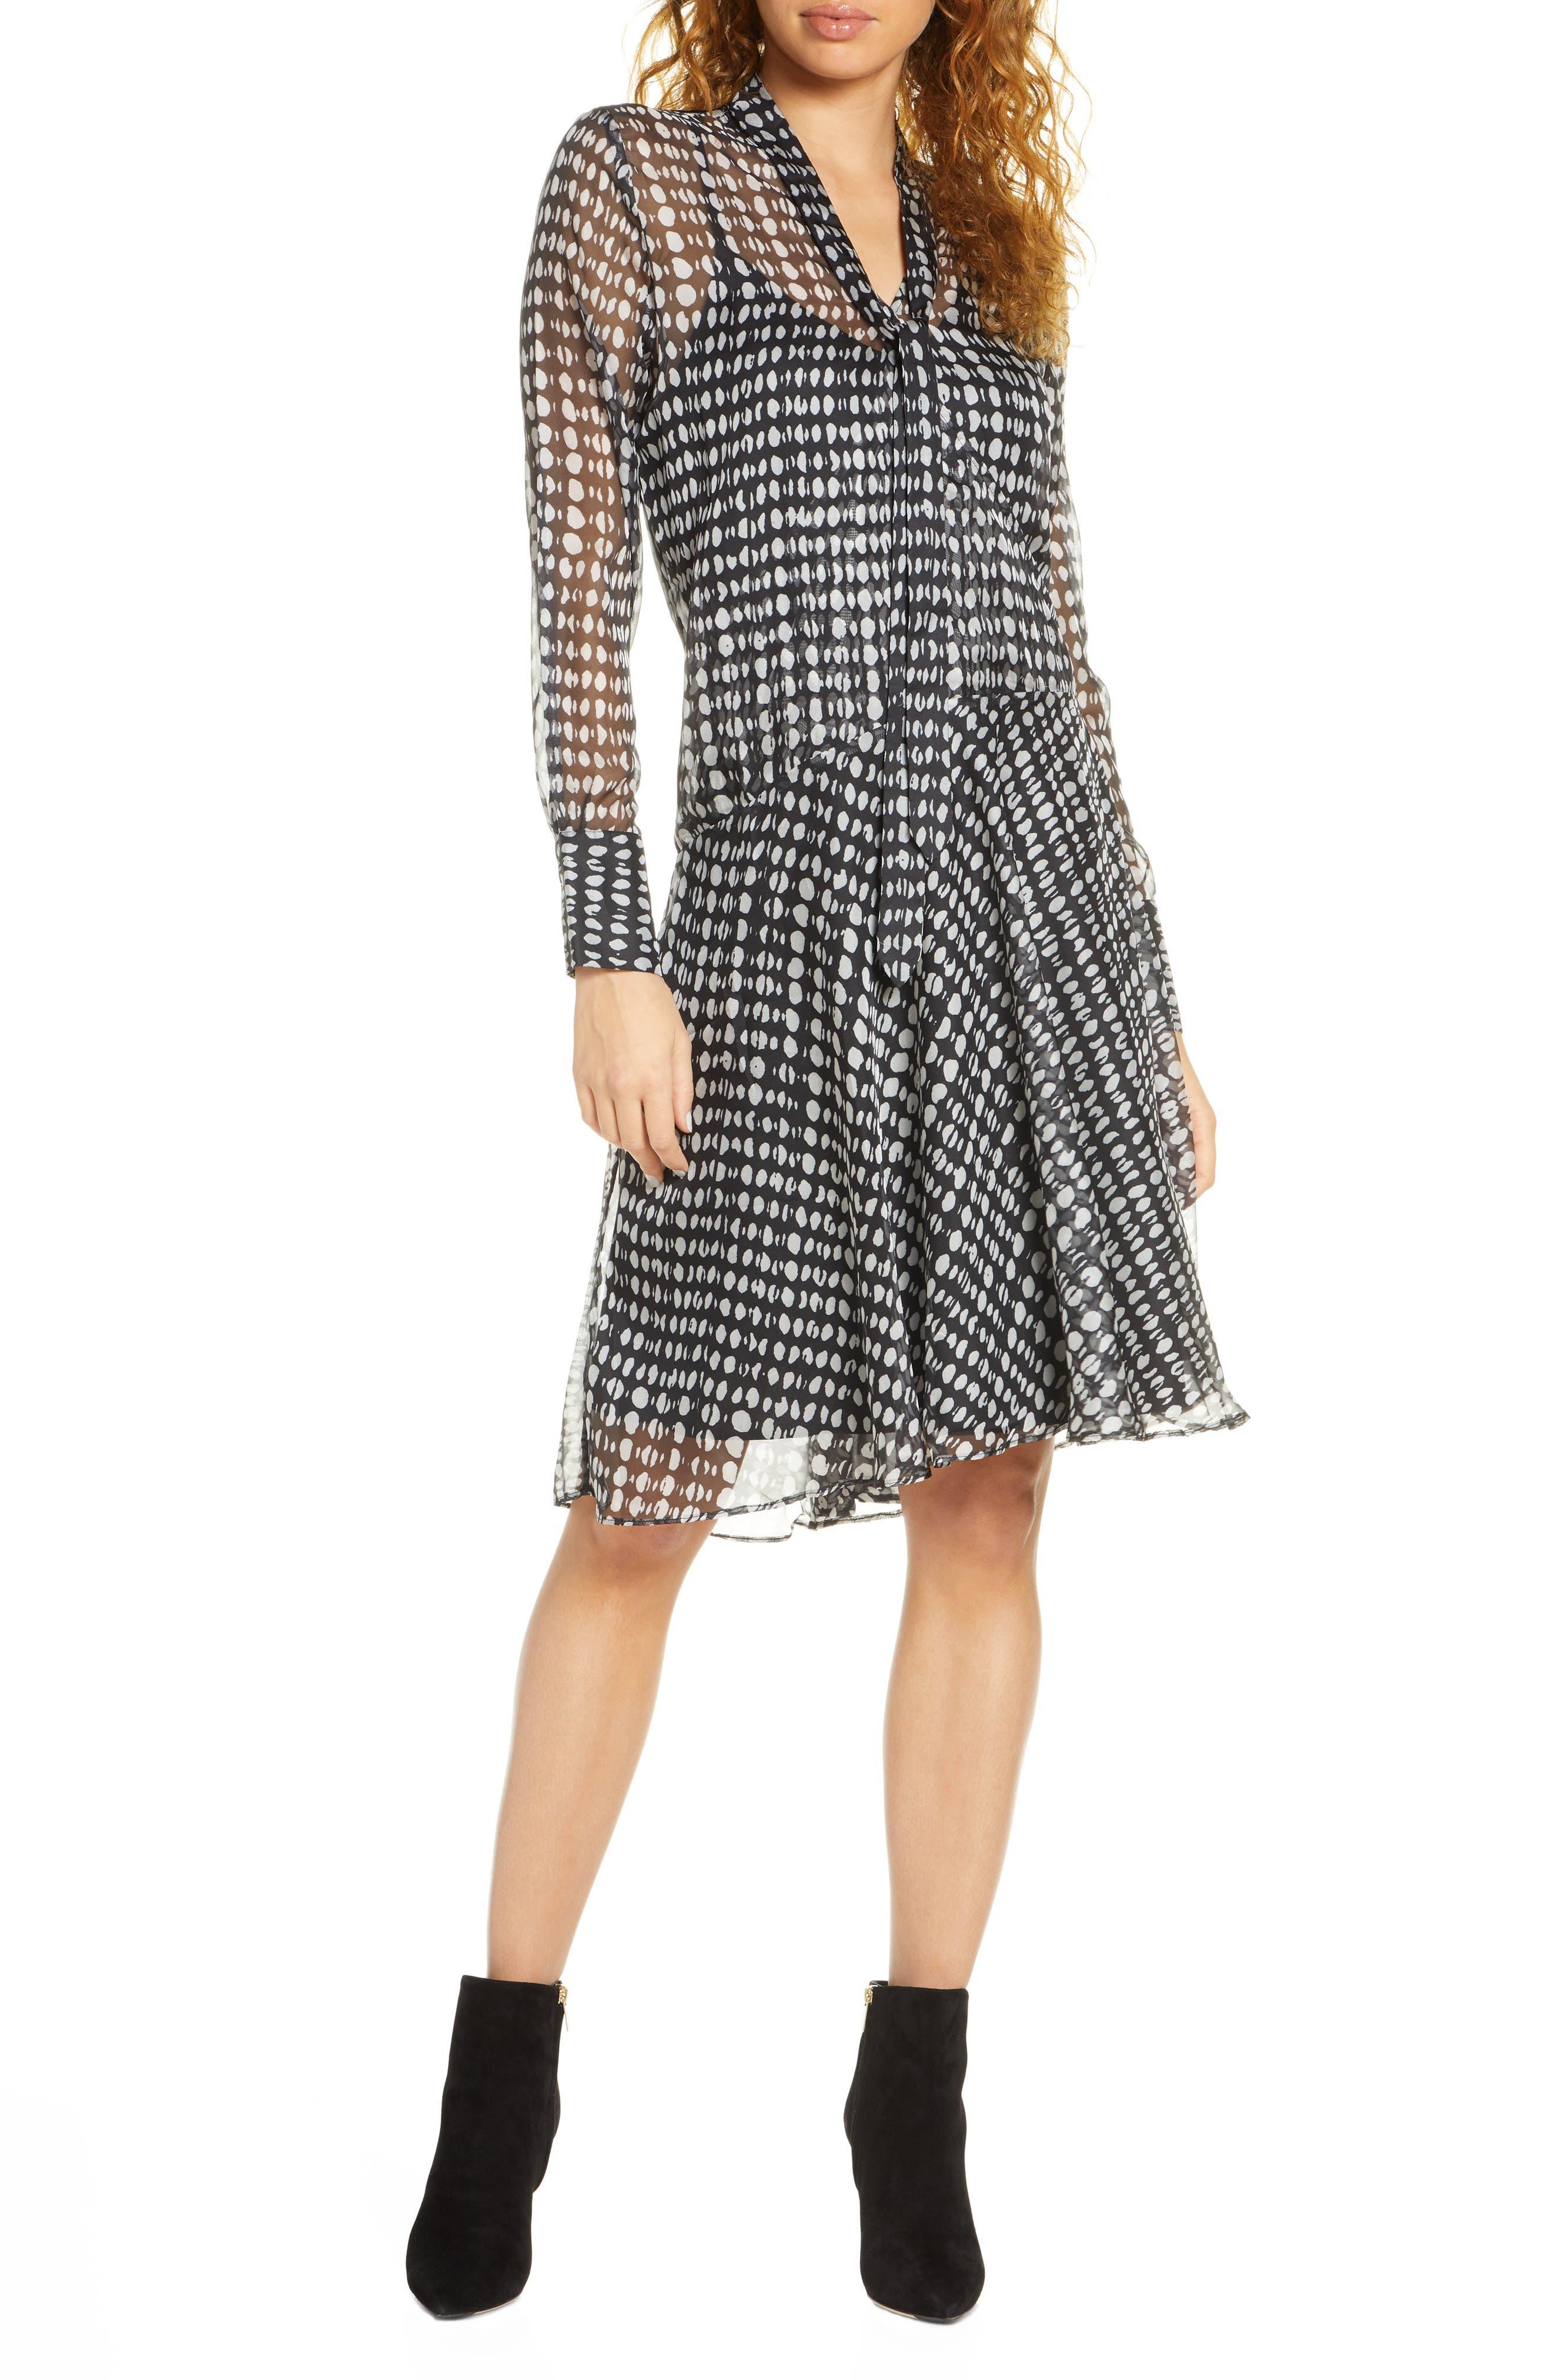 1920s Style Dresses, 20s Dresses Womens Caara Cosette Tie Neck Long Sleeve Chiffon Dress $103.80 AT vintagedancer.com